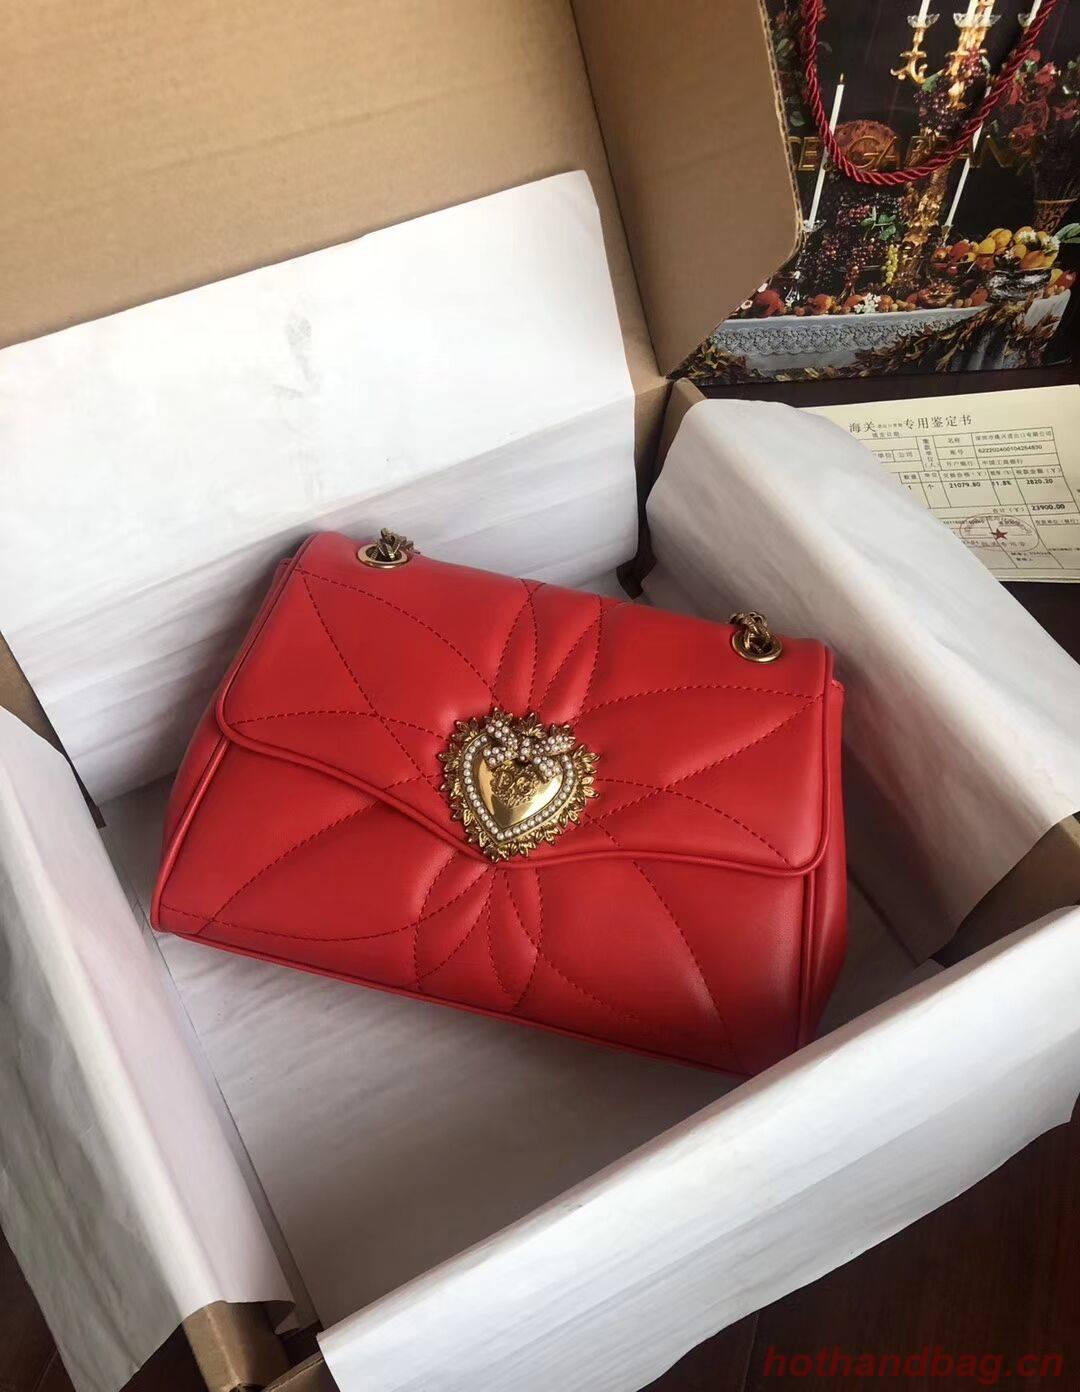 Dolce & Gabbana Origianl Leather Bag 4919 red